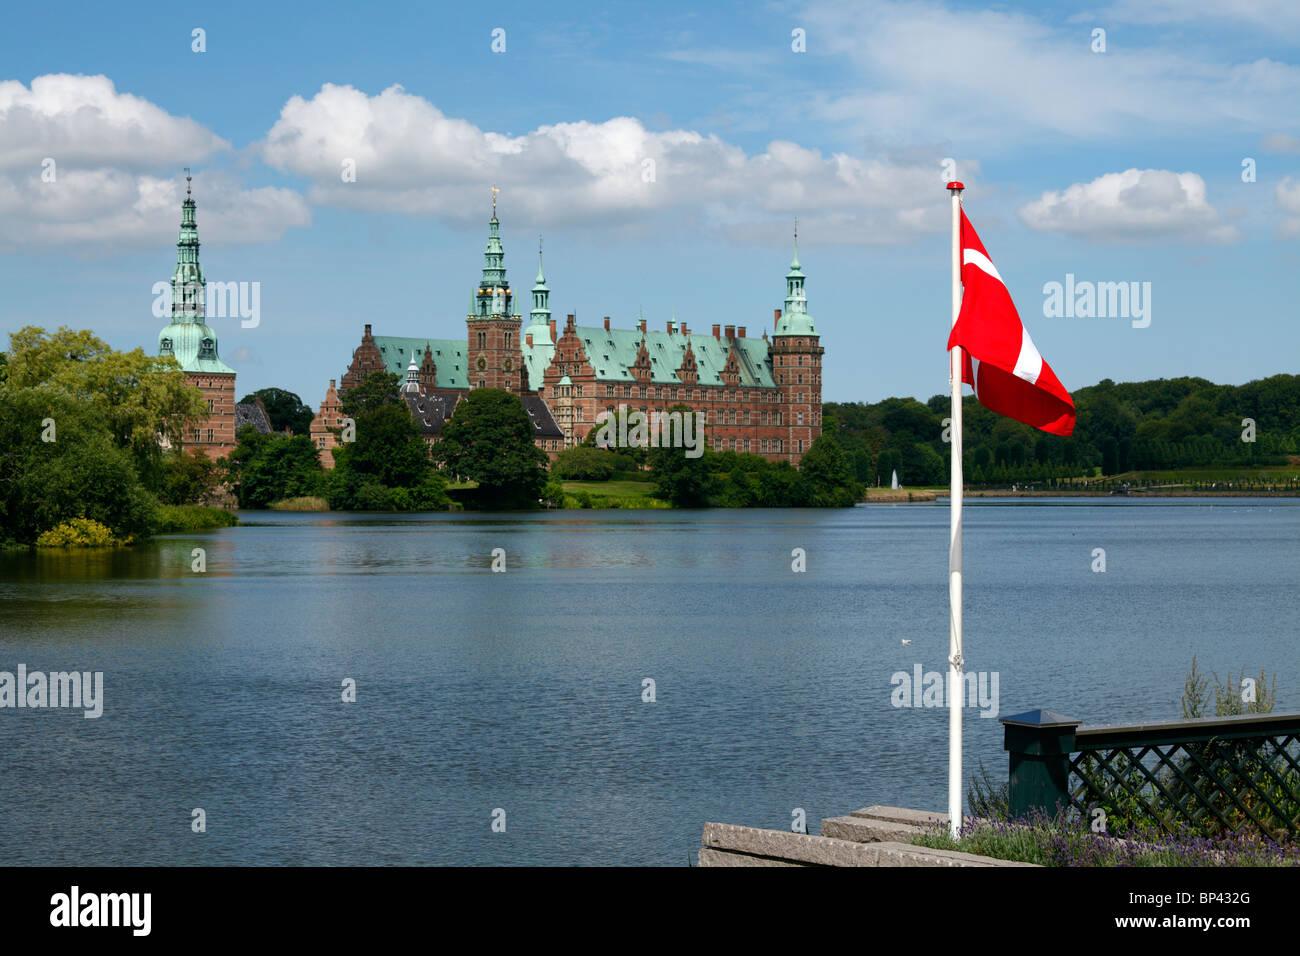 Frederiksborg Castle in Hillerød near Copenhagen, Denmark. - Stock Image